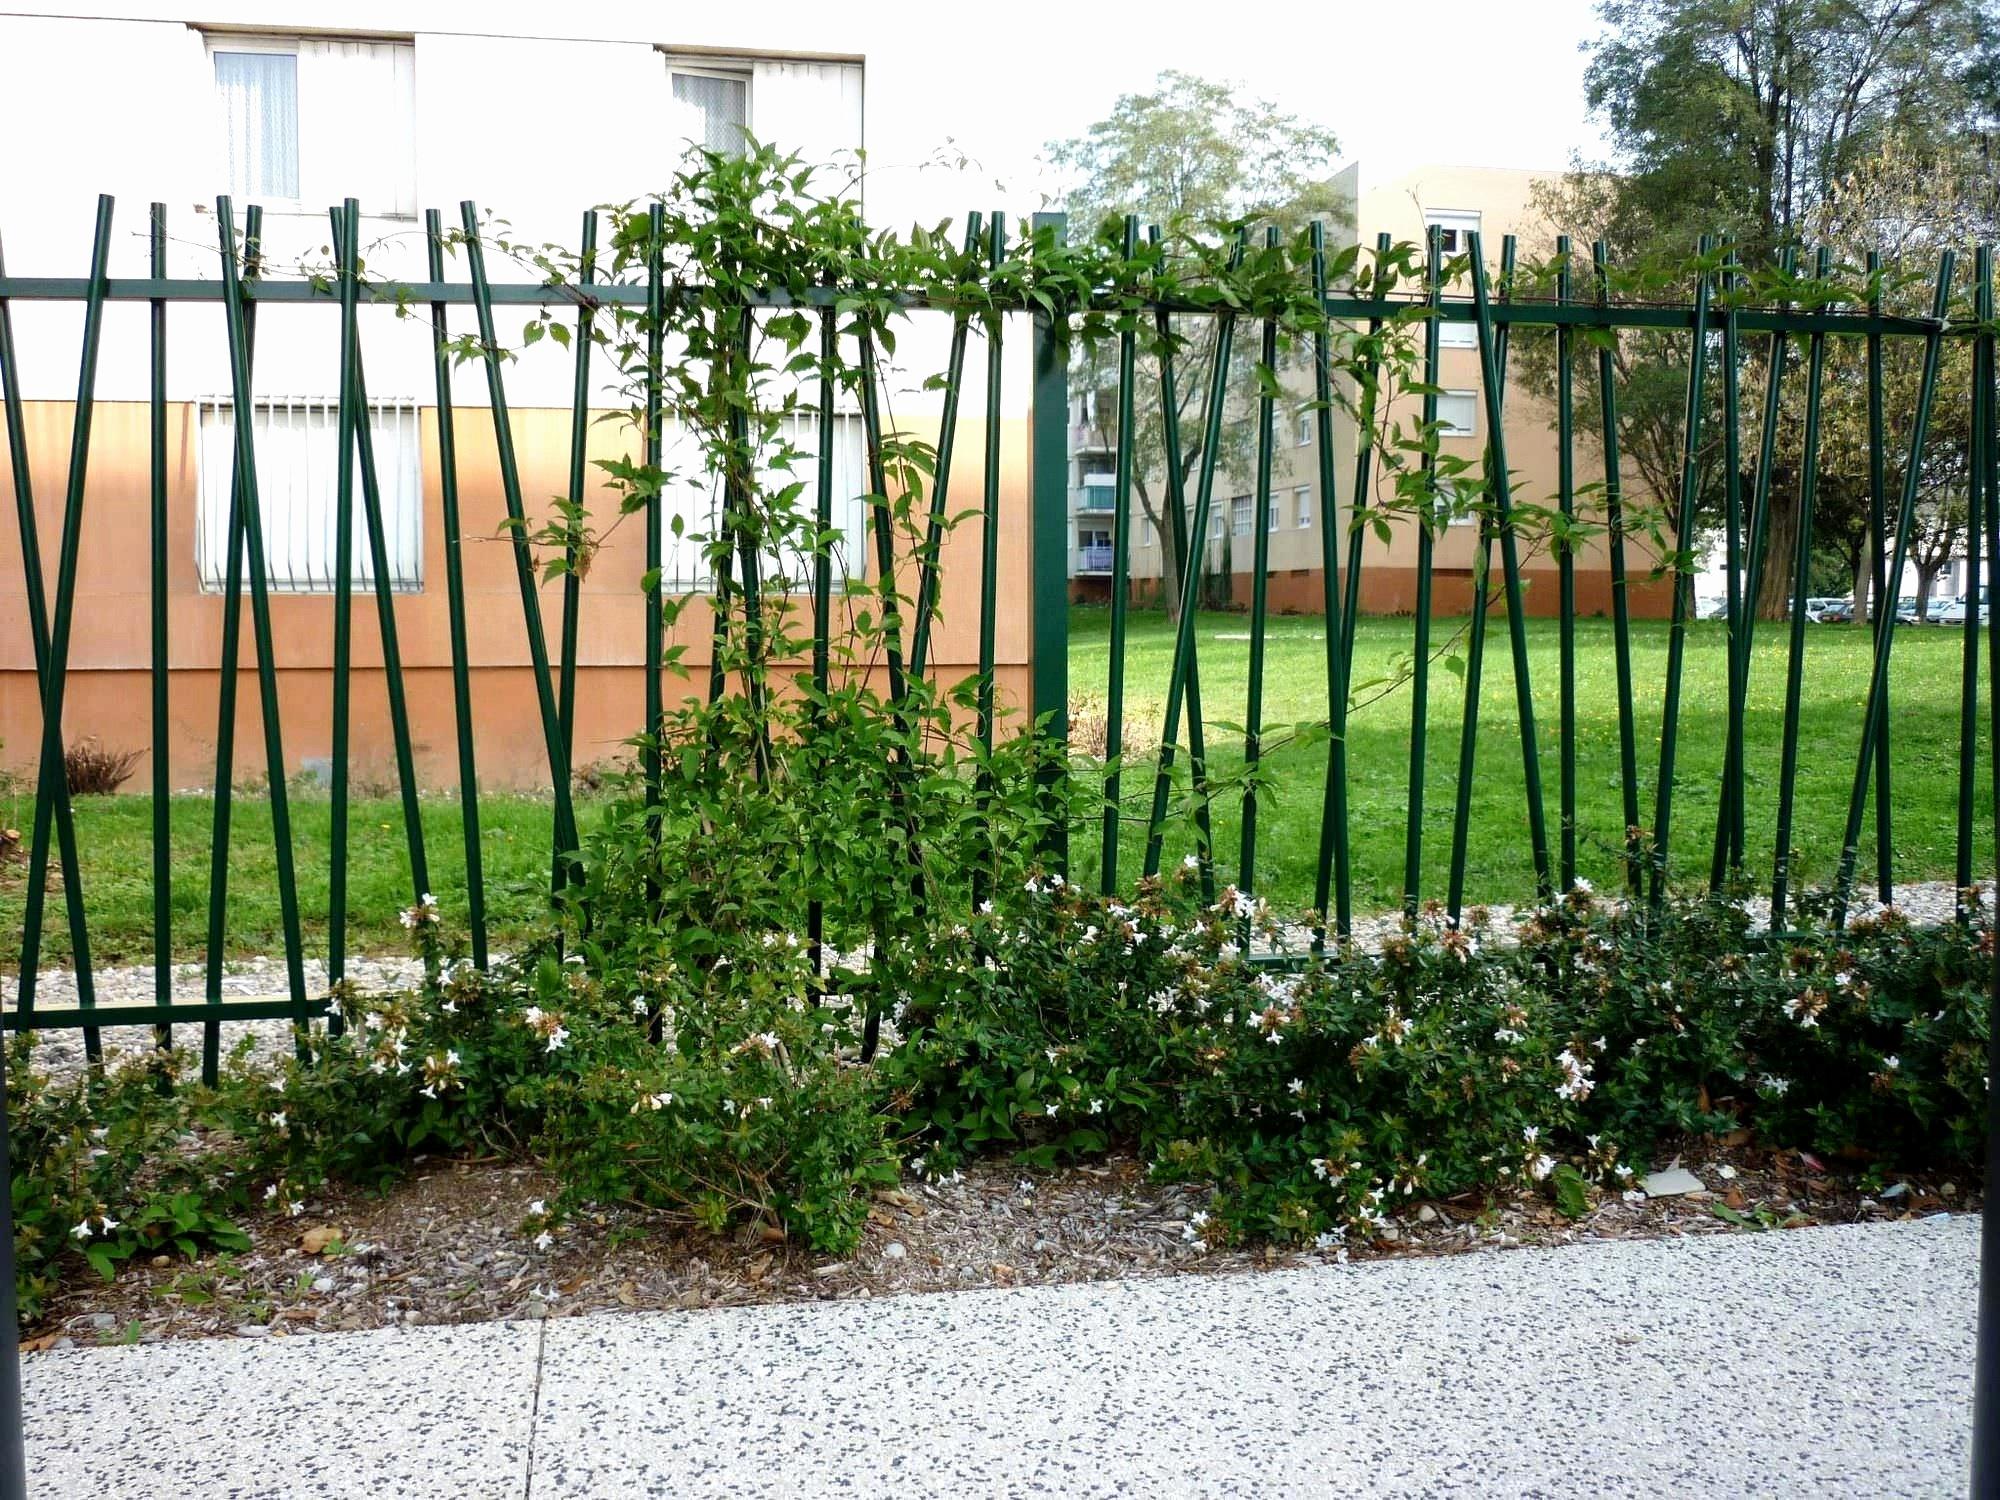 Impressionnant Abri Jardin Bois Brico Depot – Makewear tout Abris De Jardin Brico Depot